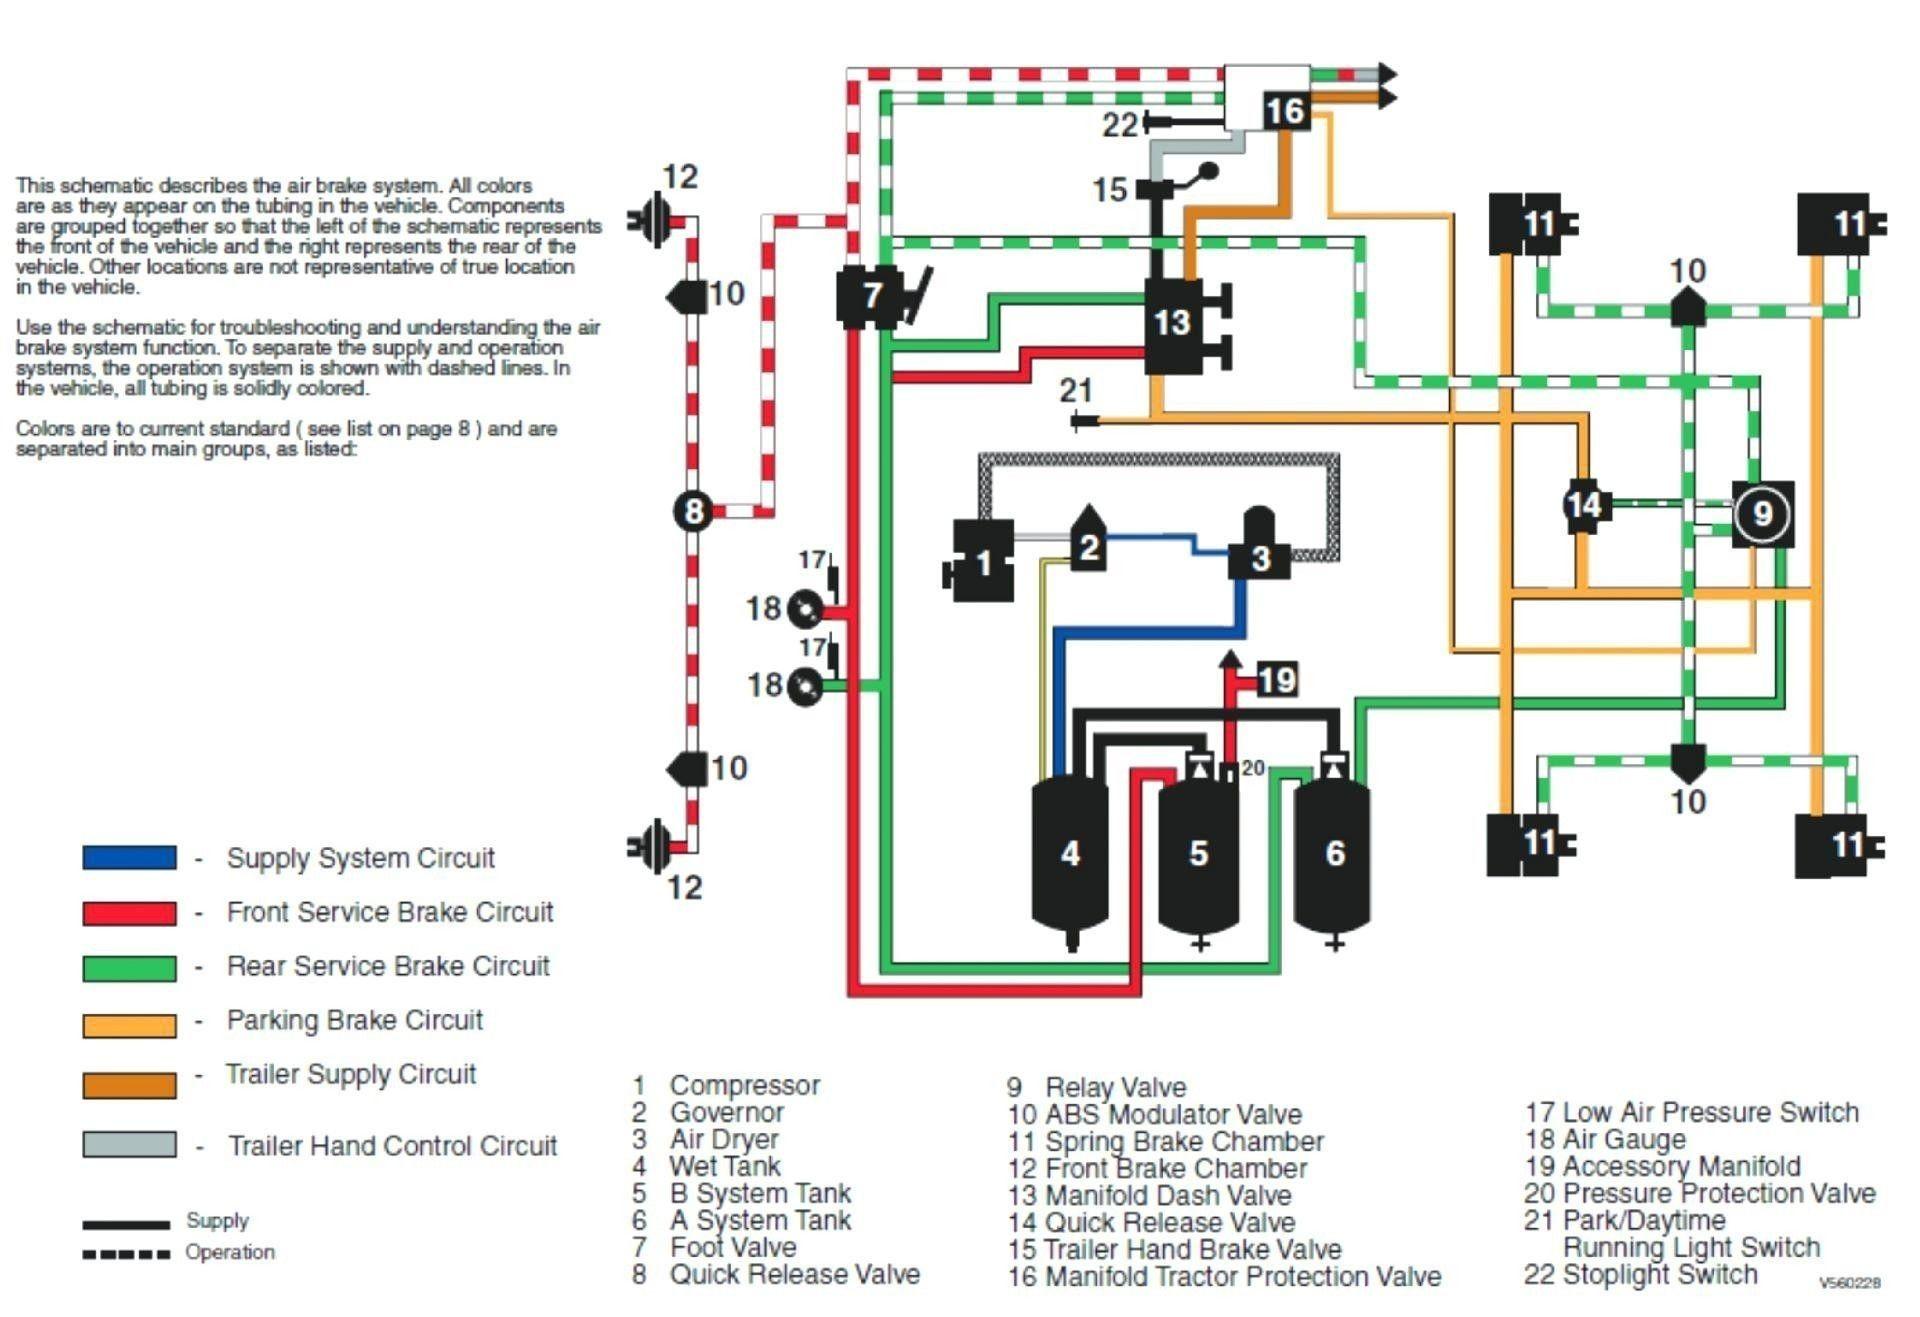 Oil Pressure Gauge Connection Diagram Car Brake Wiring Diagram Of Oil Pressure Gauge Connection Diagram